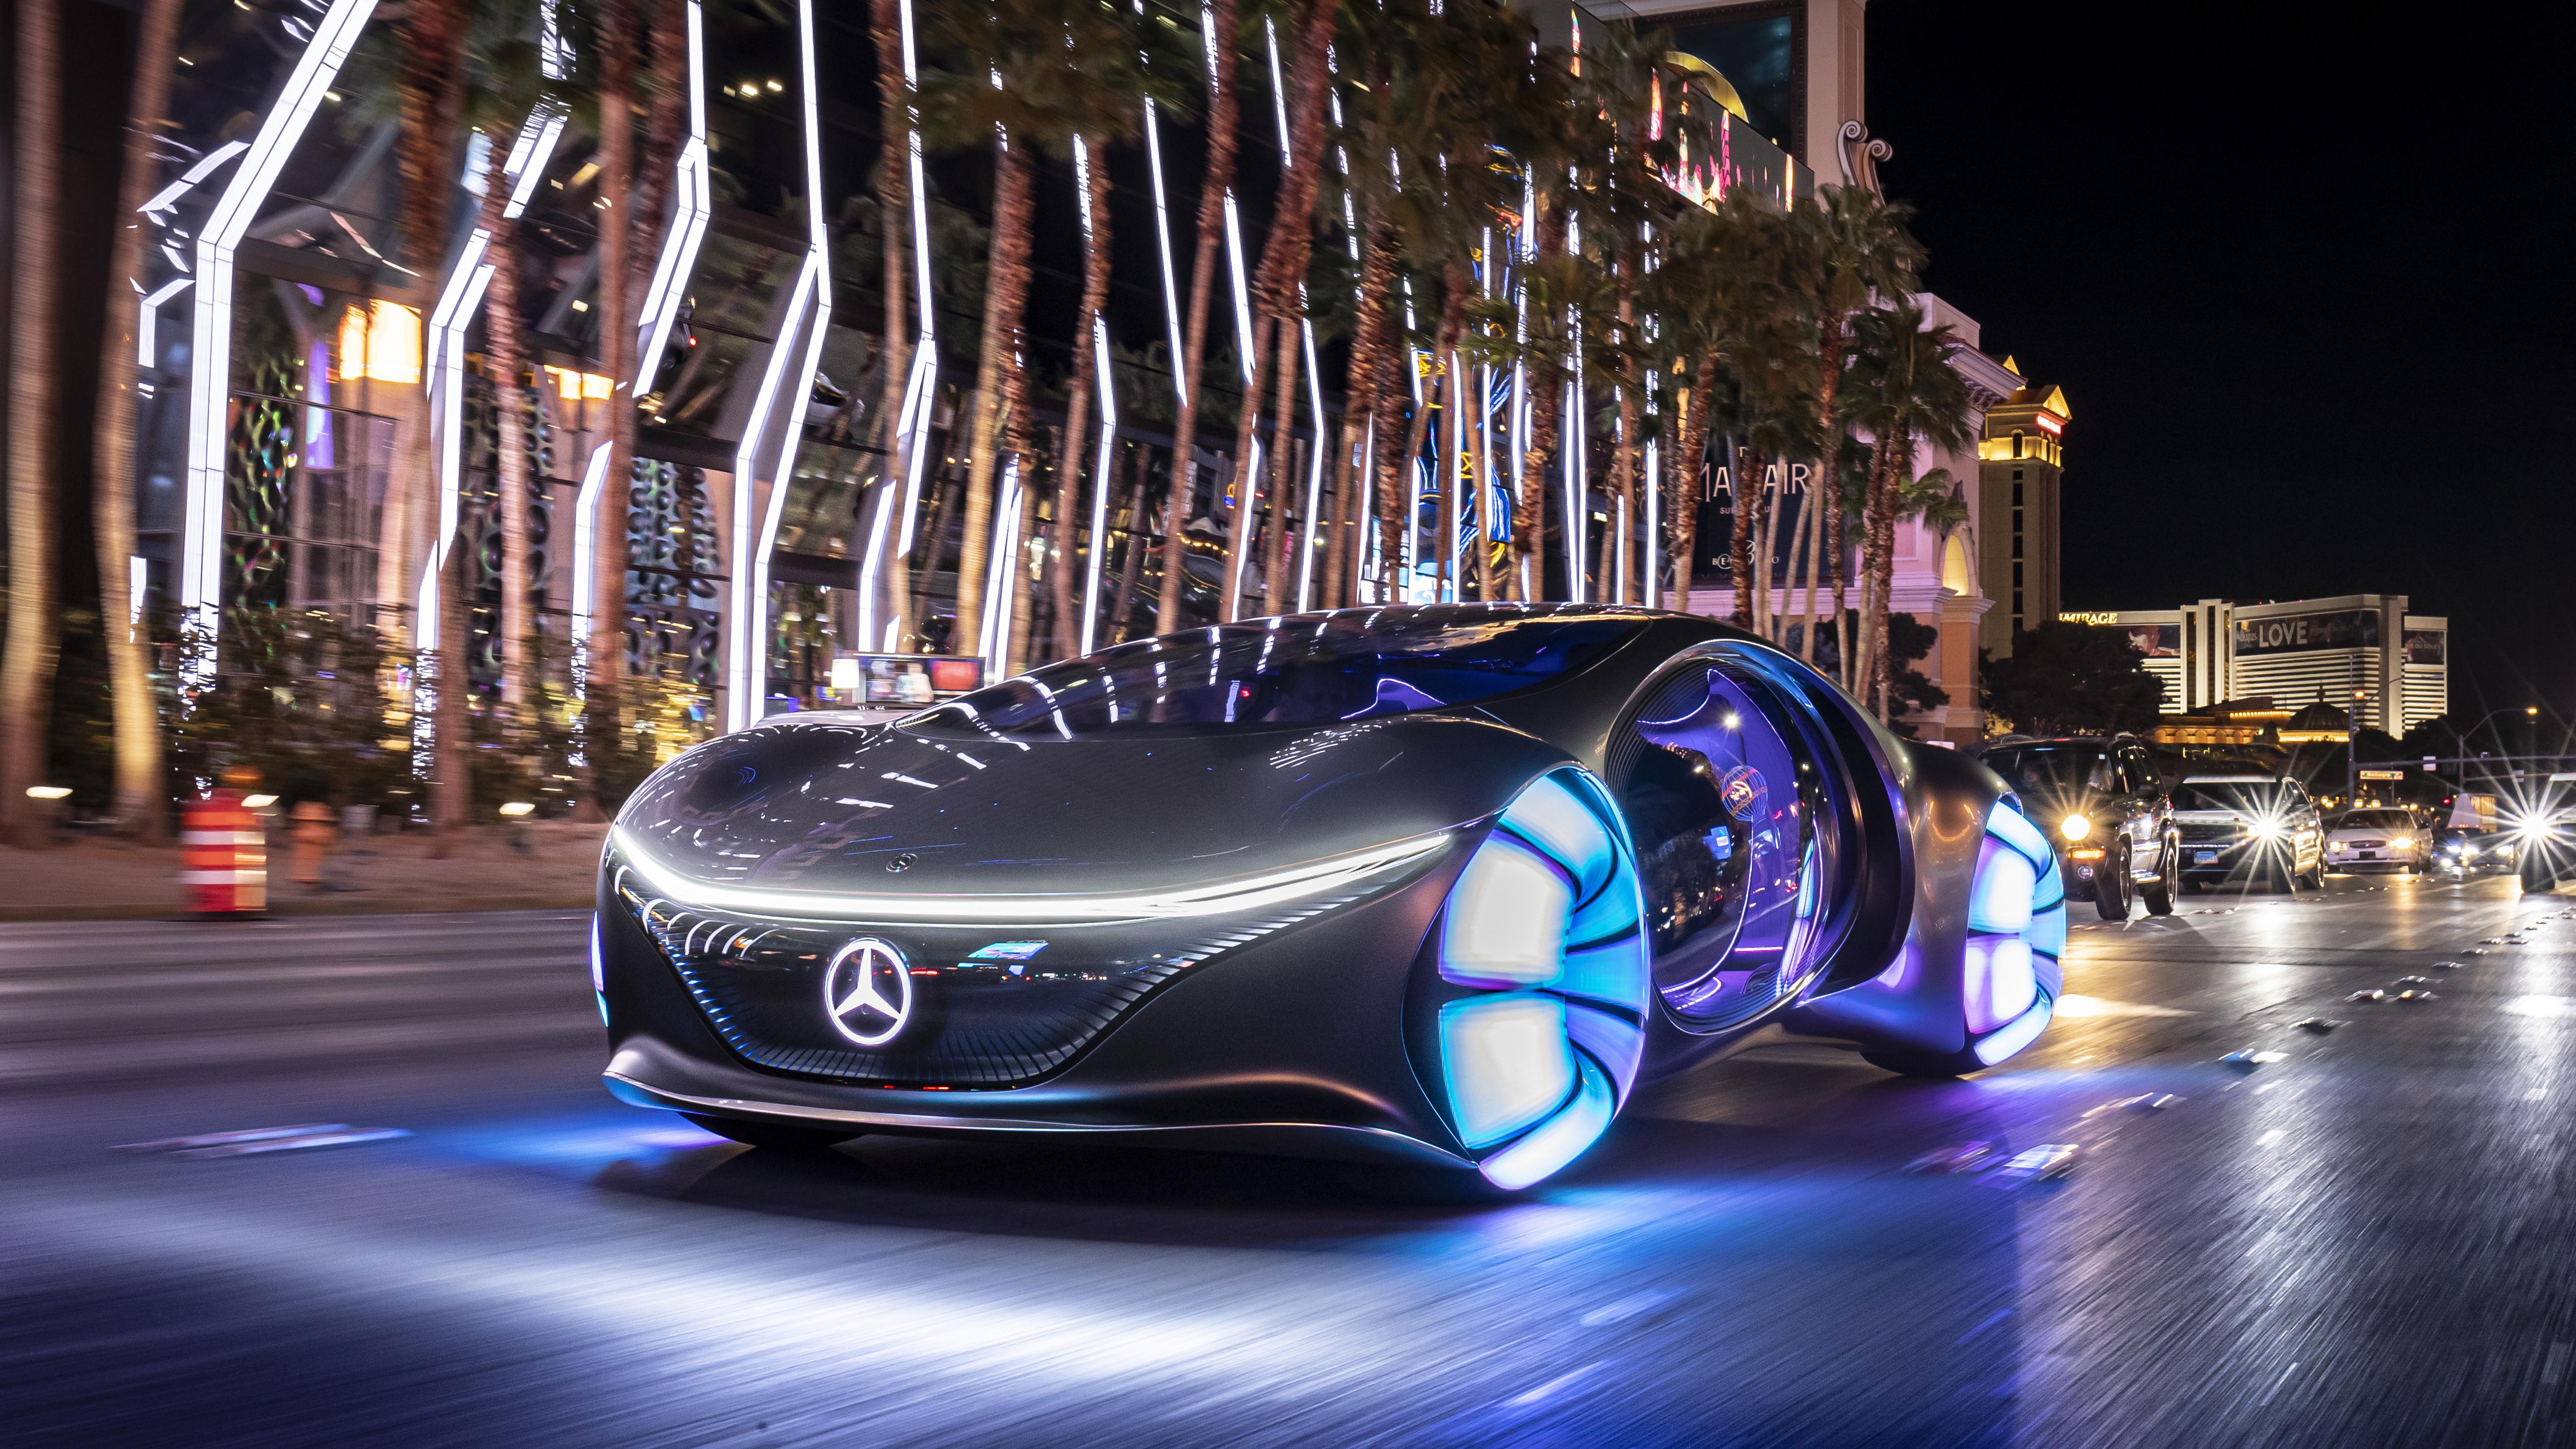 2020 Mercedes Benz VISION AVTR 5K 5 Wallpaper HD Car Wallpapers 5120x2880